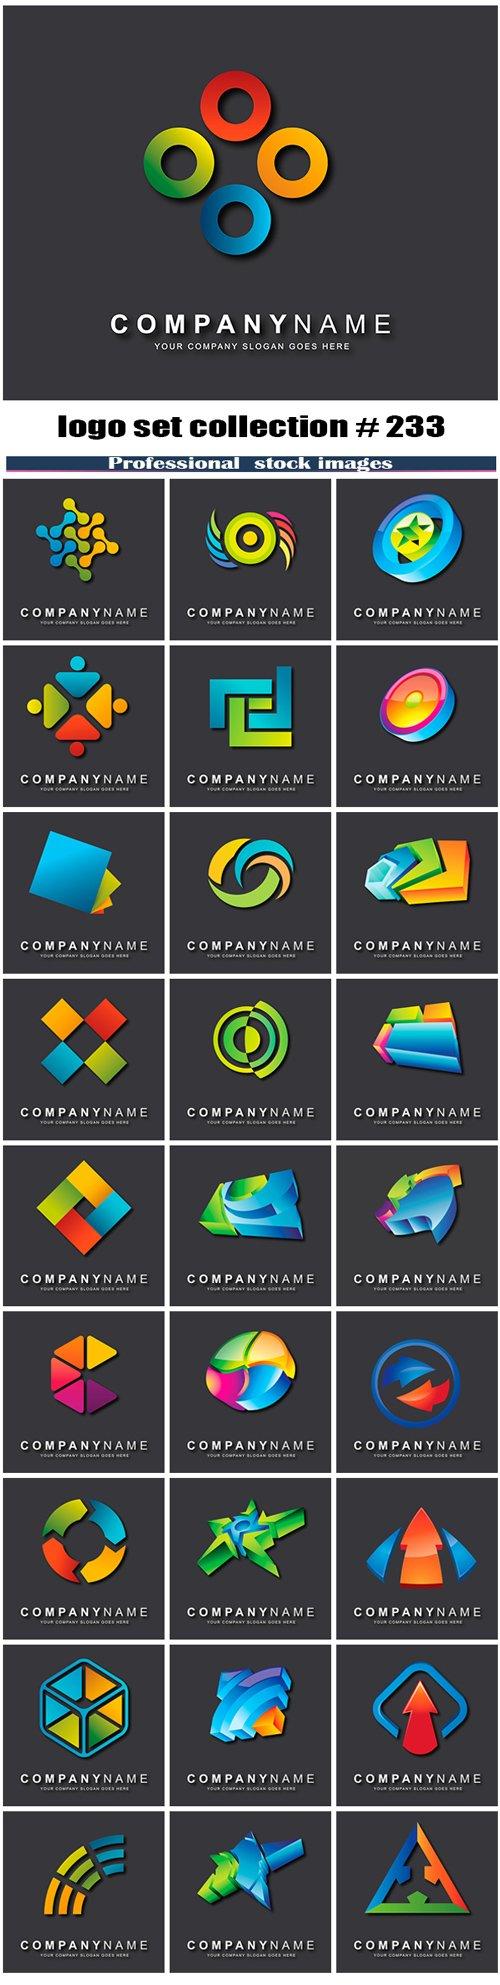 logo set collection # 233